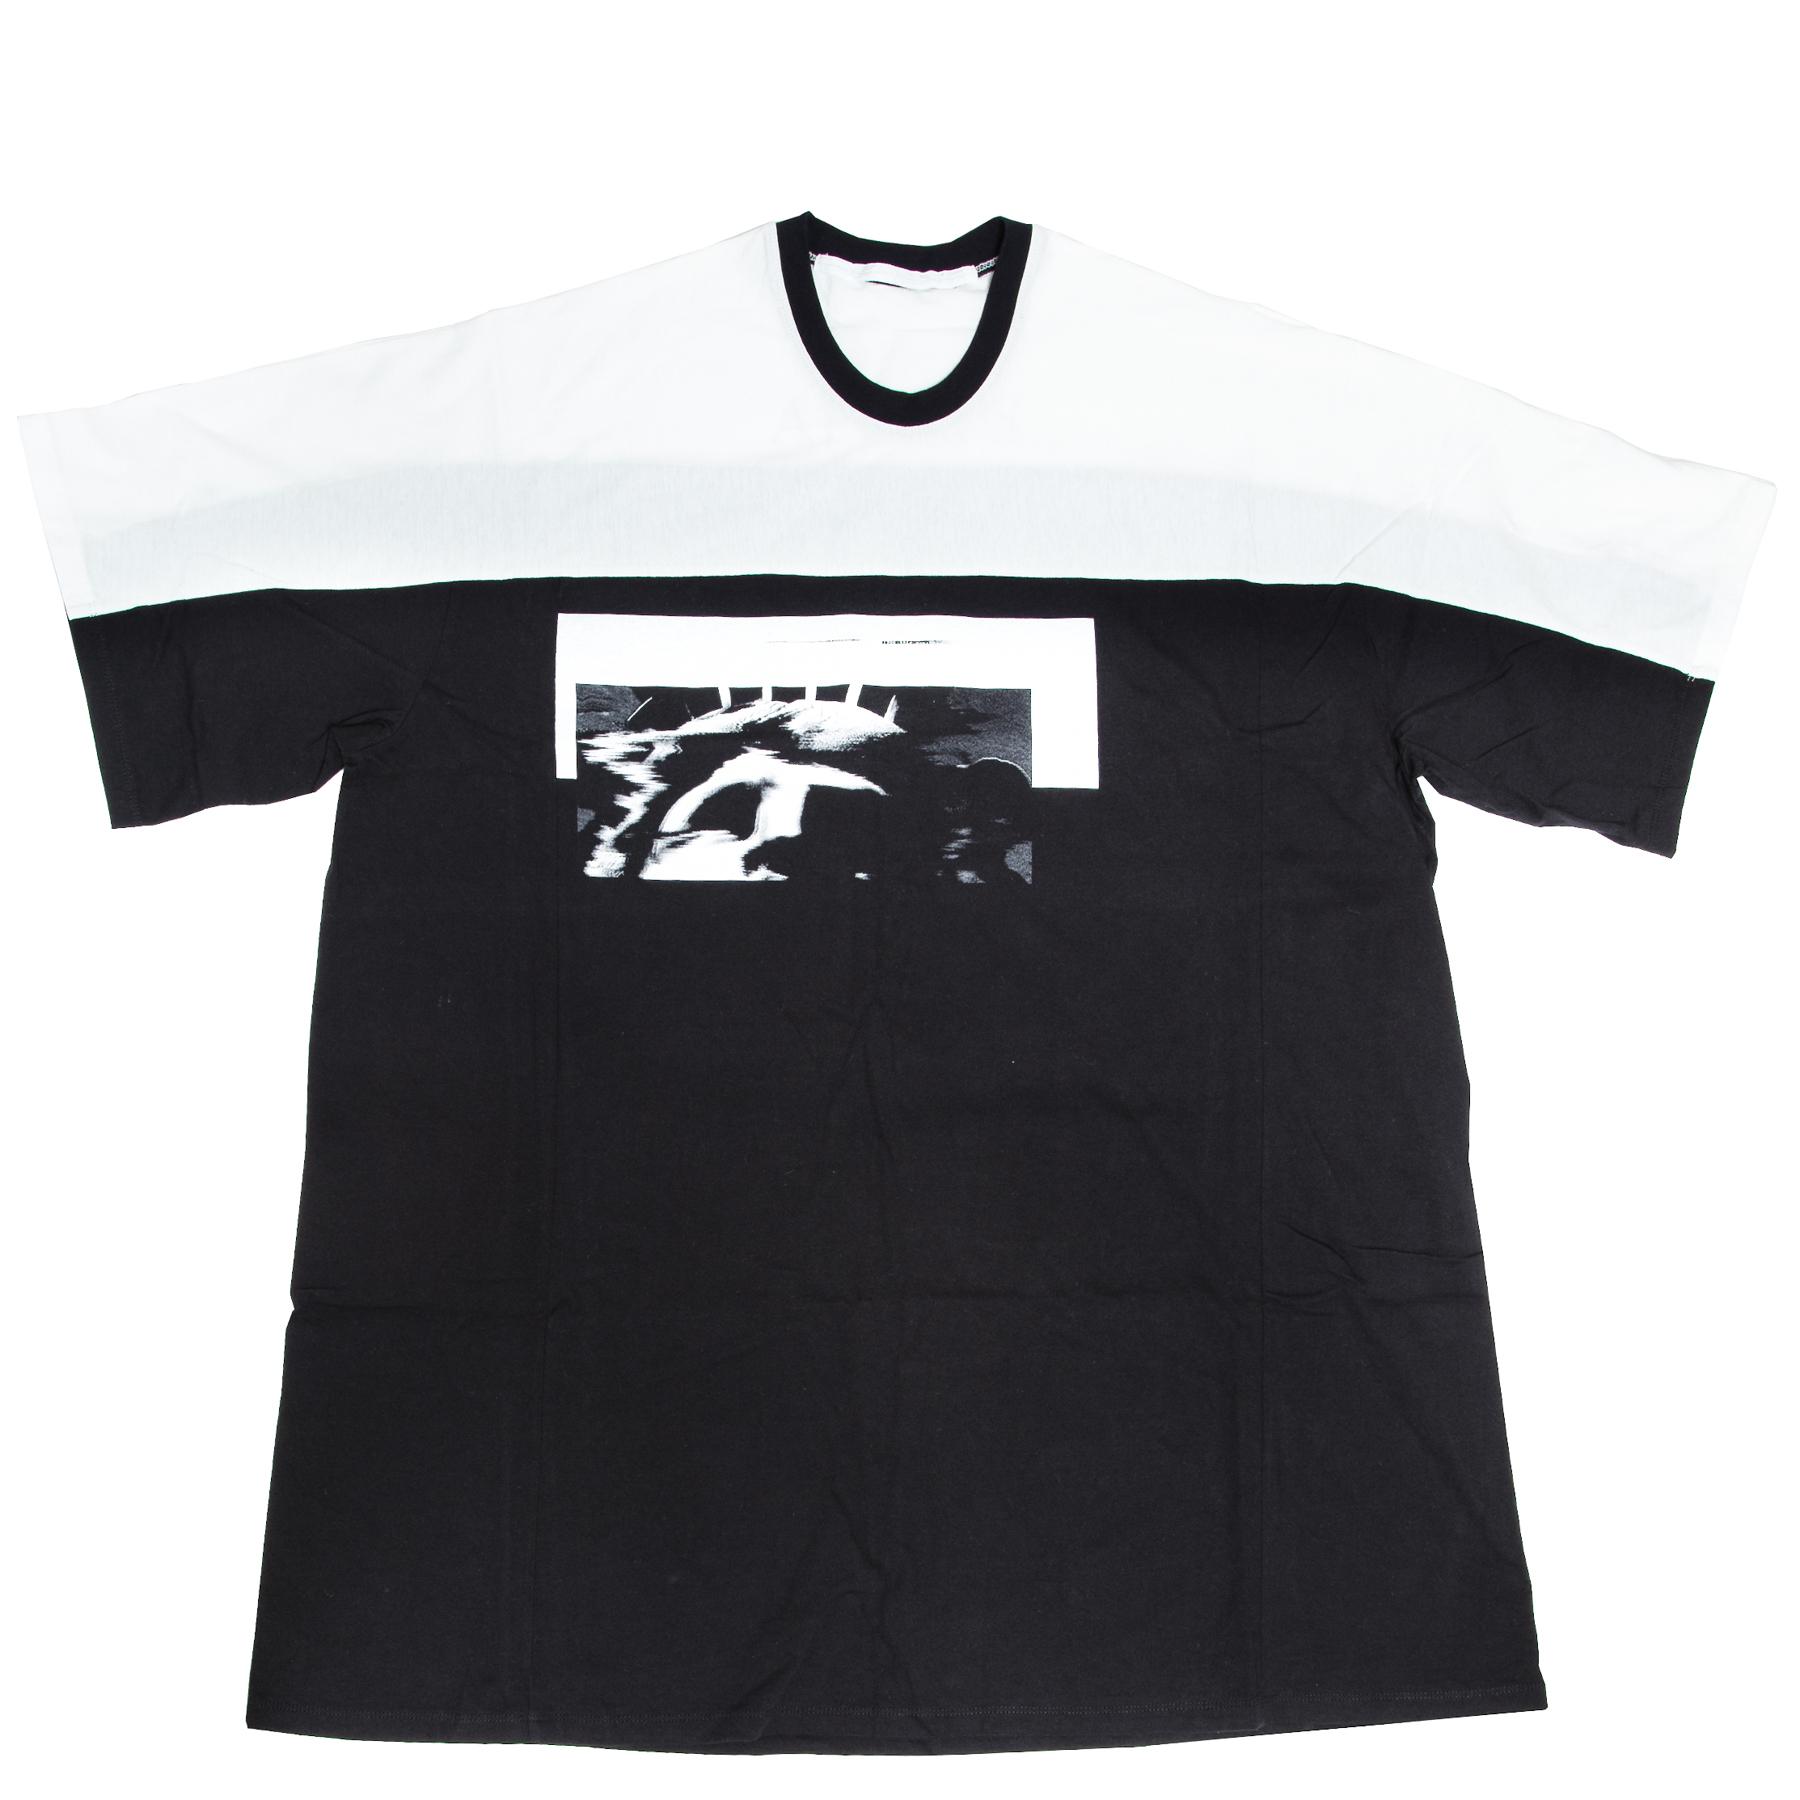 617CPM20-OFF / S.O.L. ビッグT-シャツ